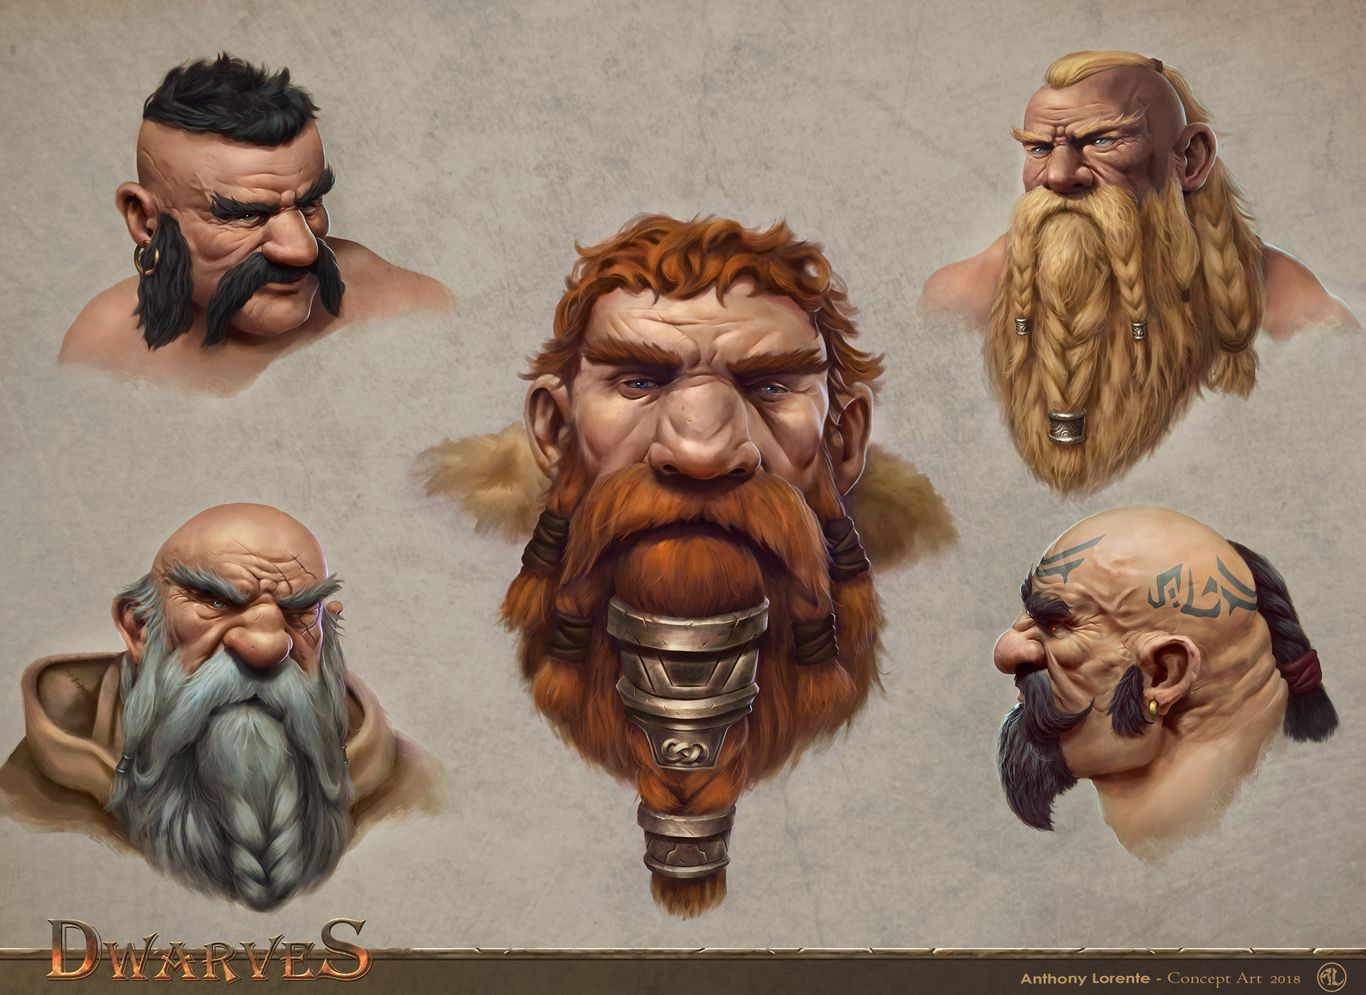 Rugged Male Character Design Male Character Design Older Evil Male Character Design Personagens De Rpg Arte Com Personagens Arte Conceitual De Personagens